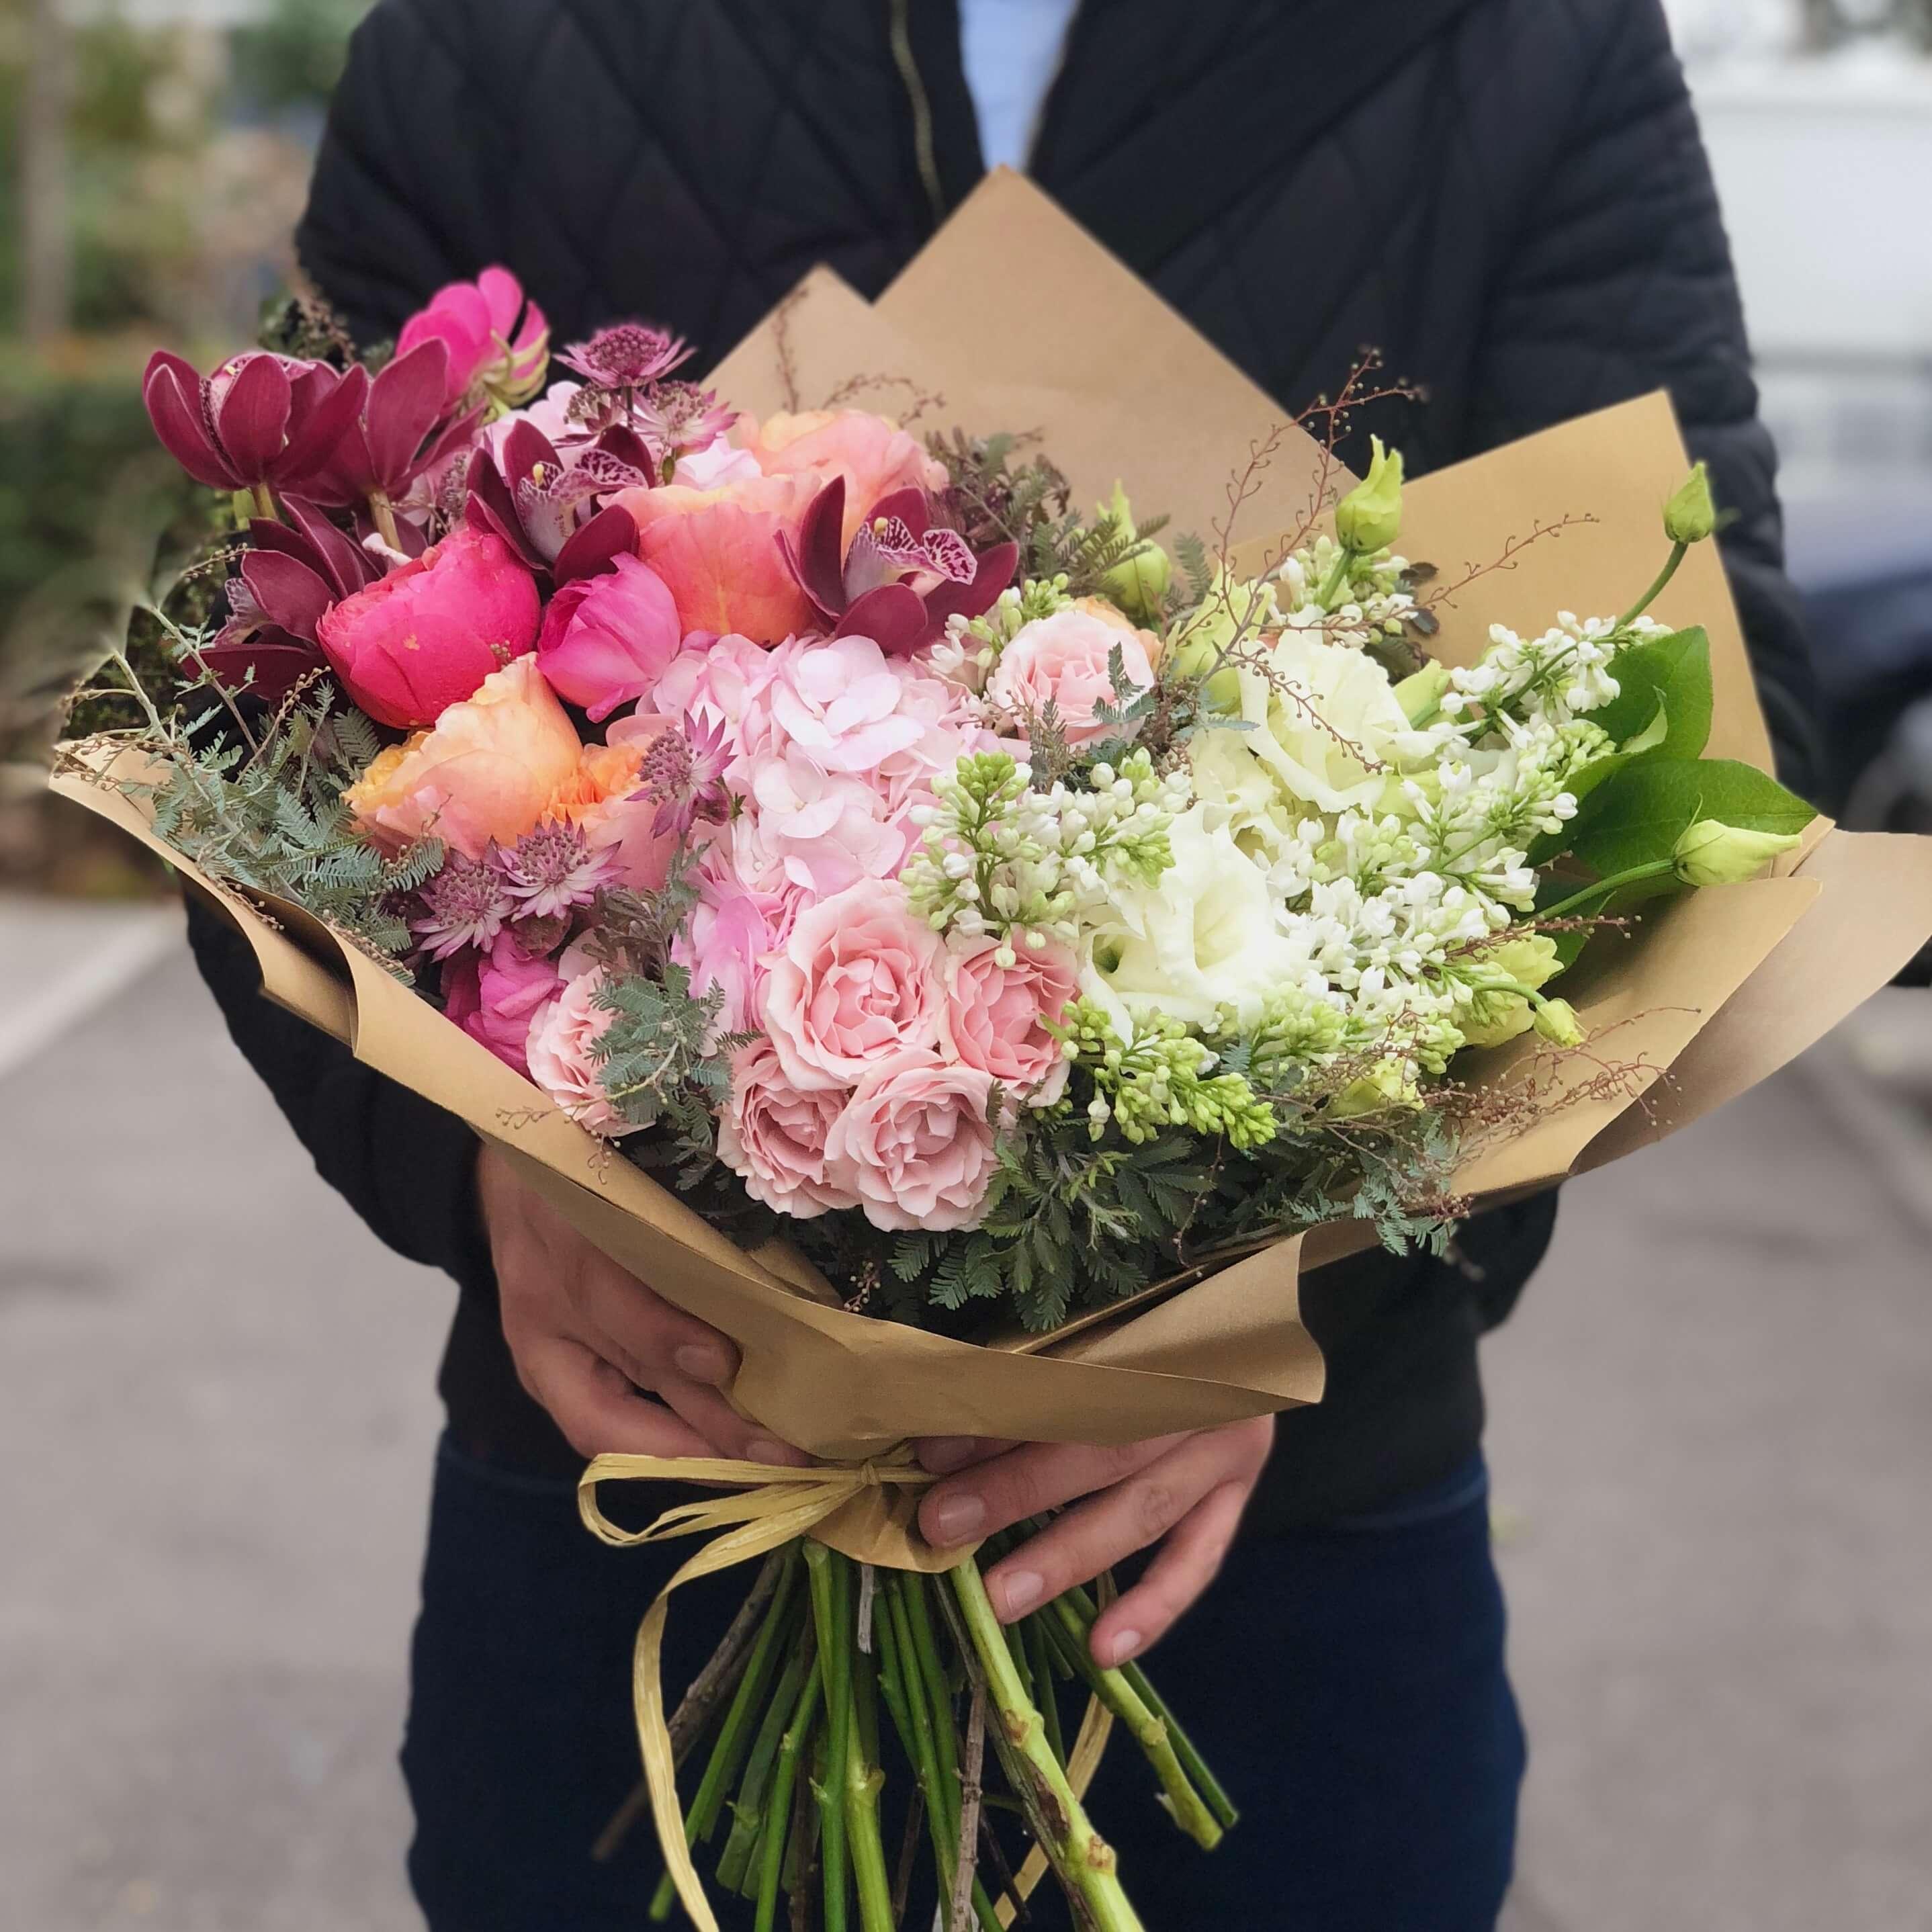 Buchet De Flori Surpriza Dulce Imodflowers